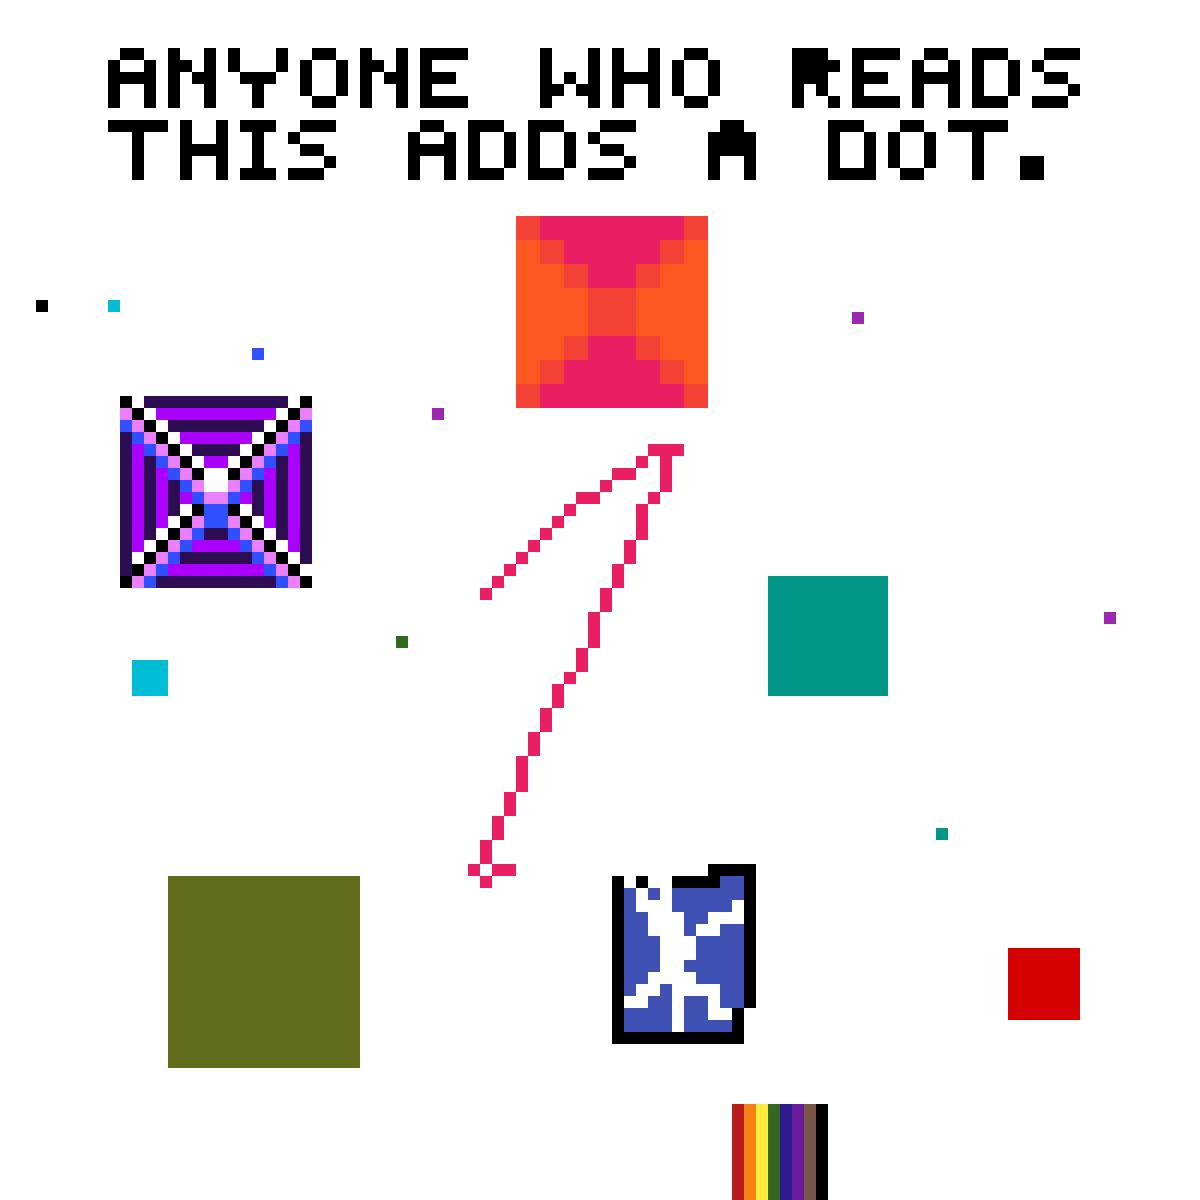 Add a dot! by Historypanda